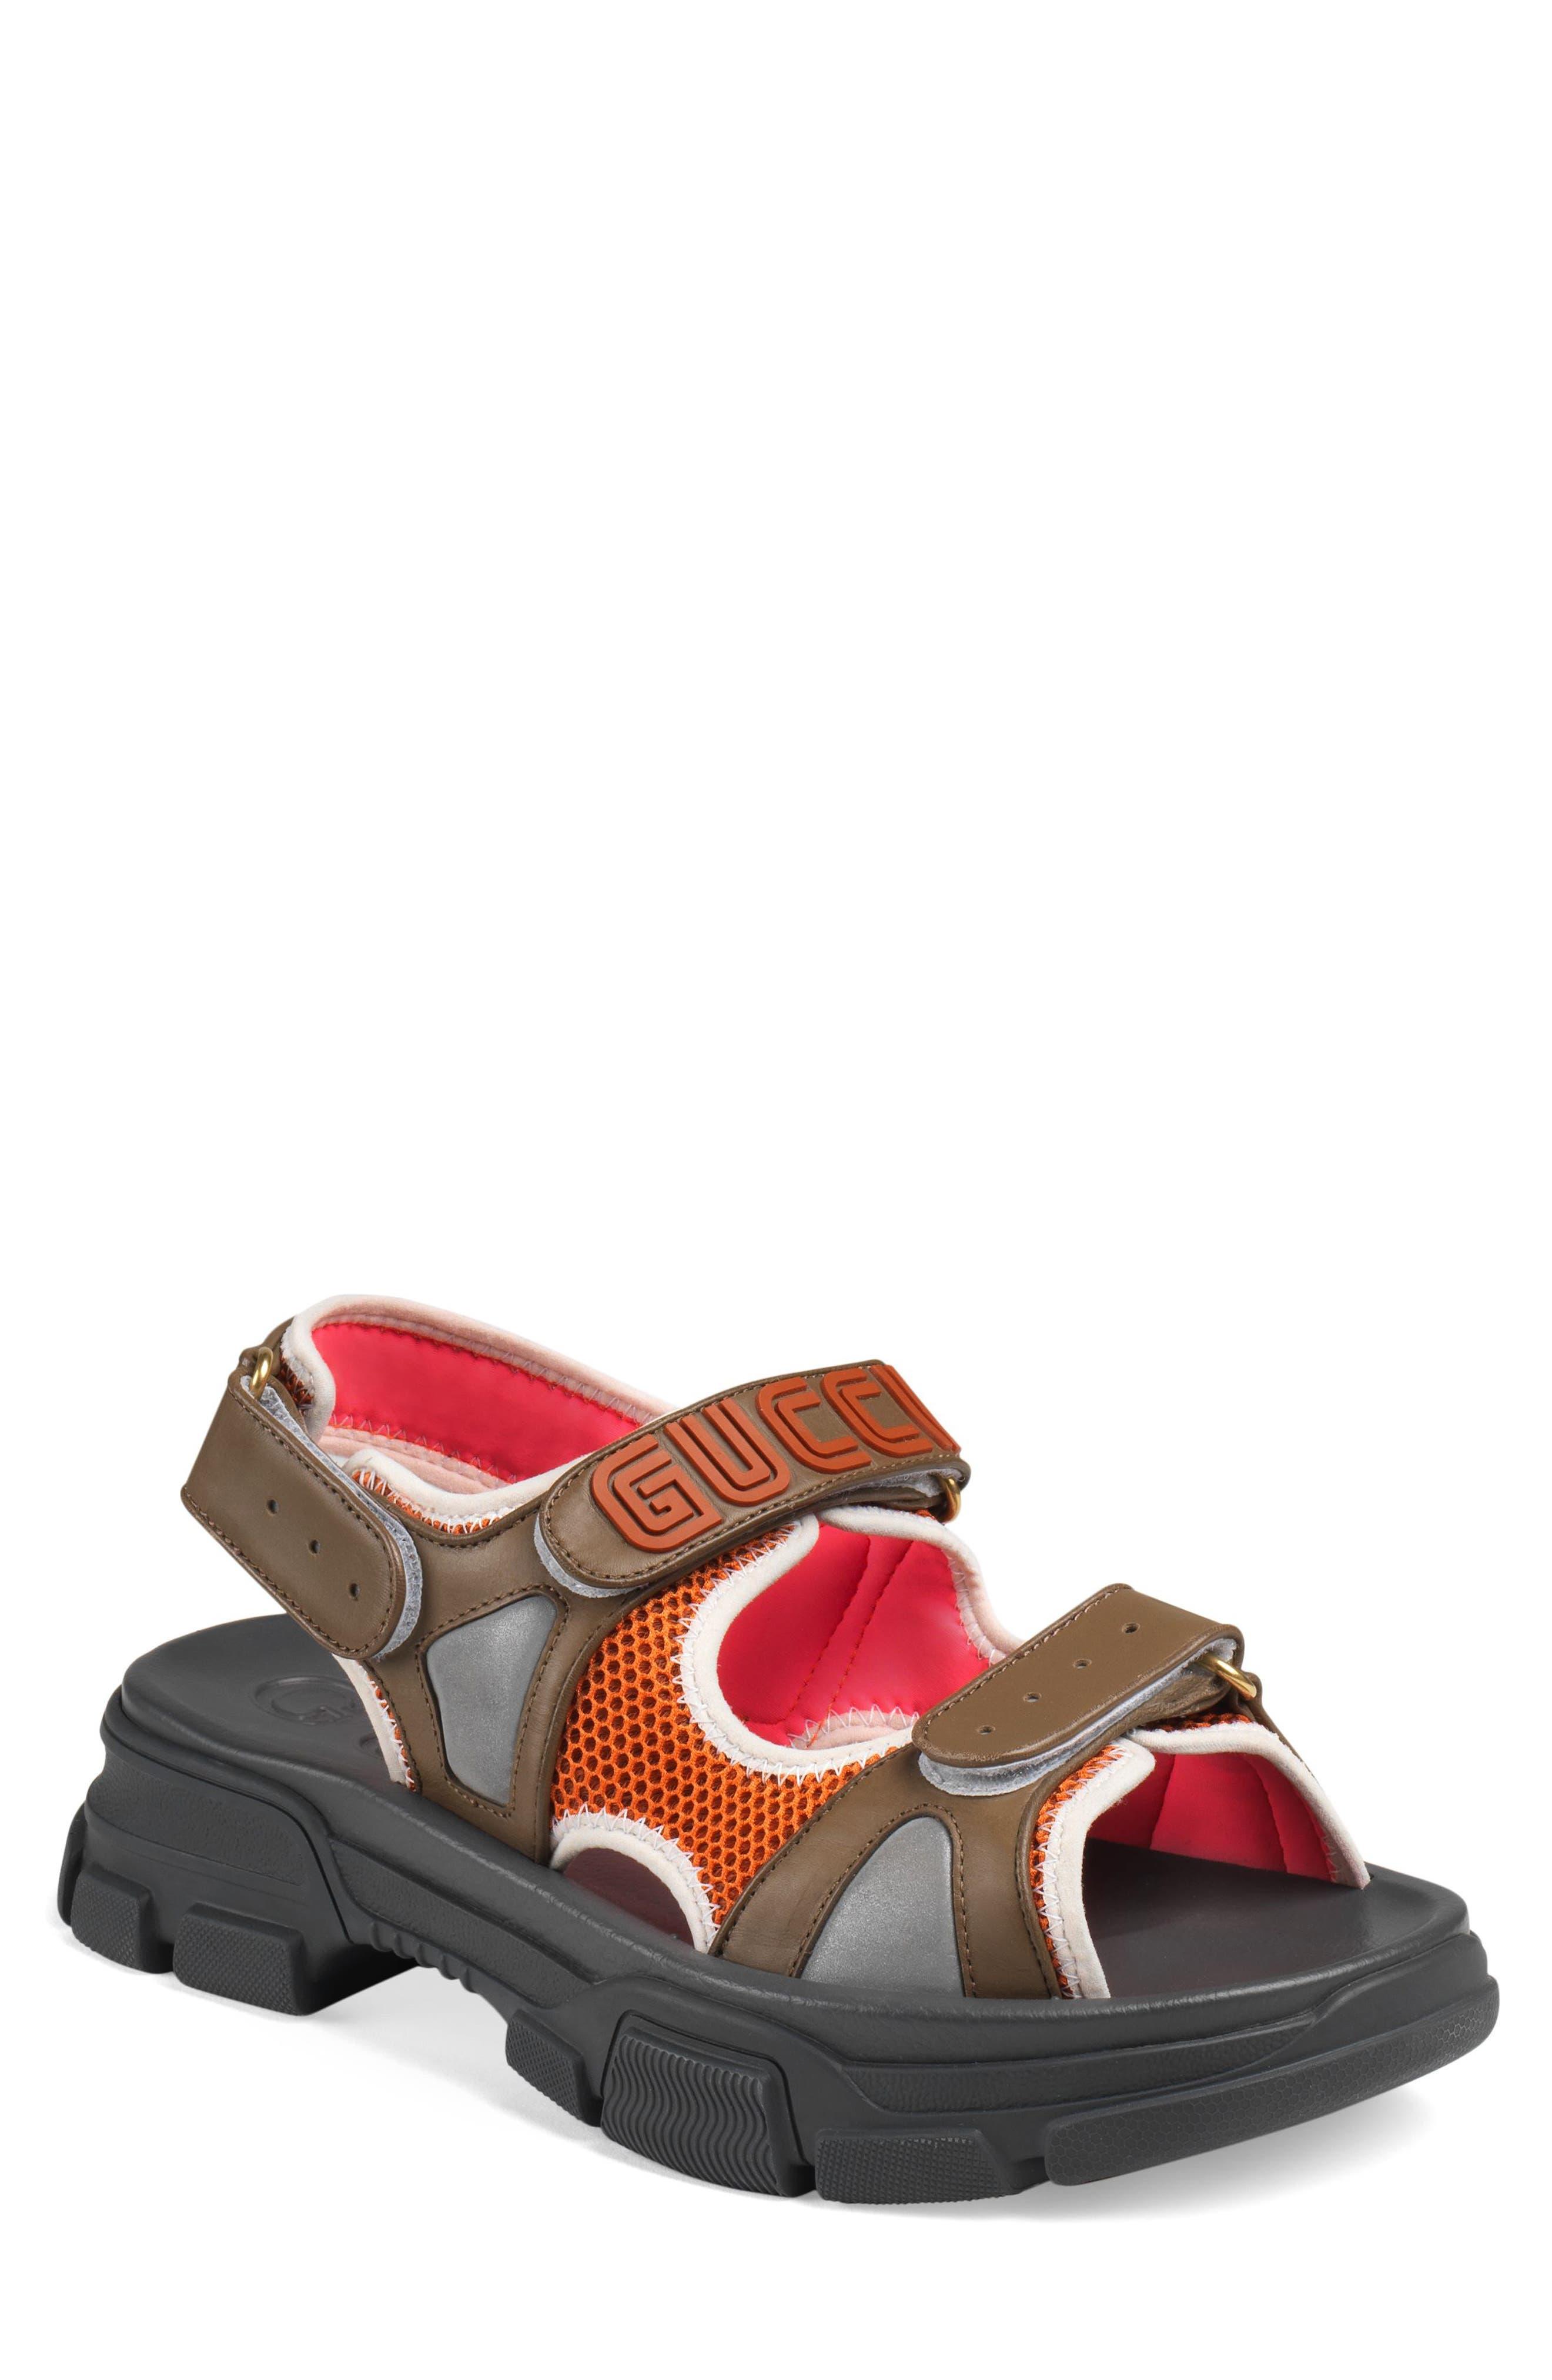 Agru Sport Sandal,                             Main thumbnail 1, color,                             BROWN